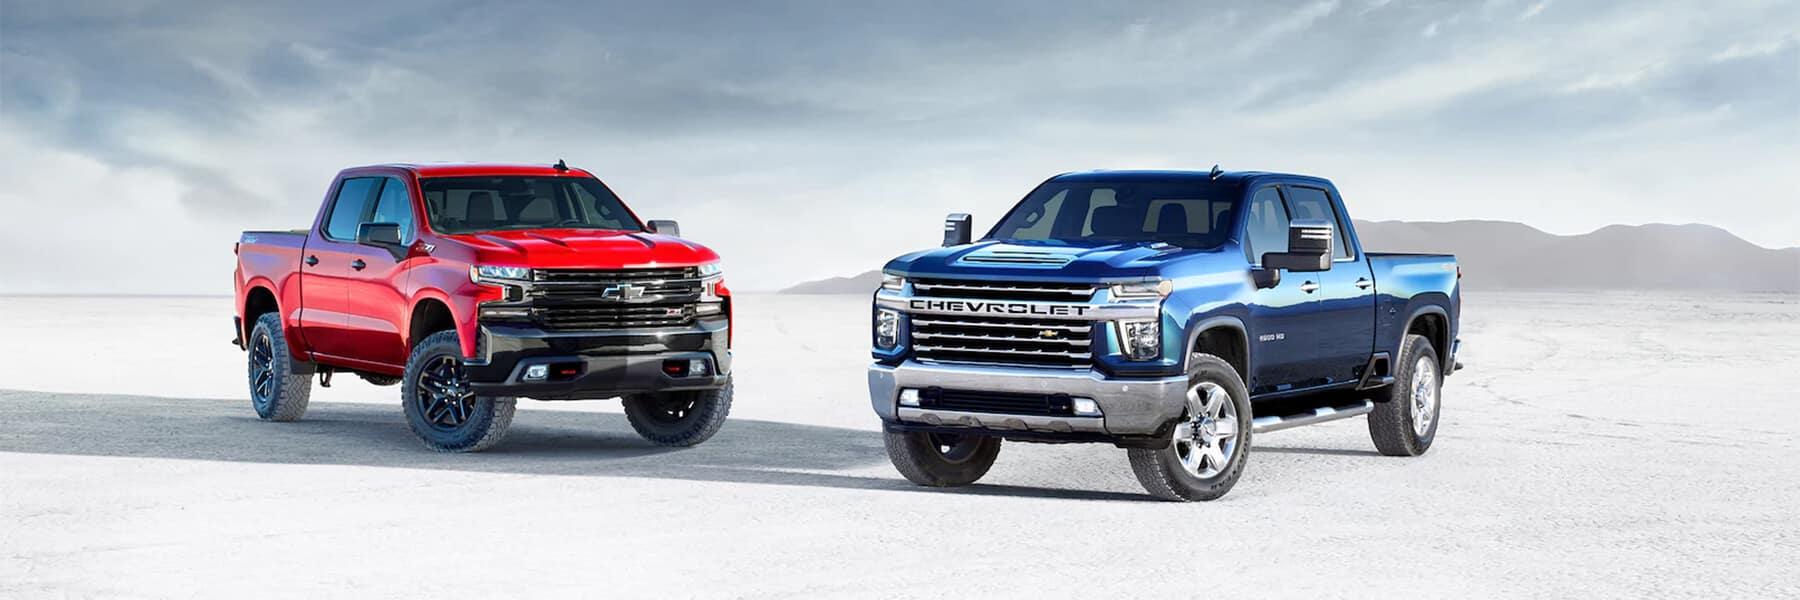 Chevrolet Silverado Family of Pickup Trucks